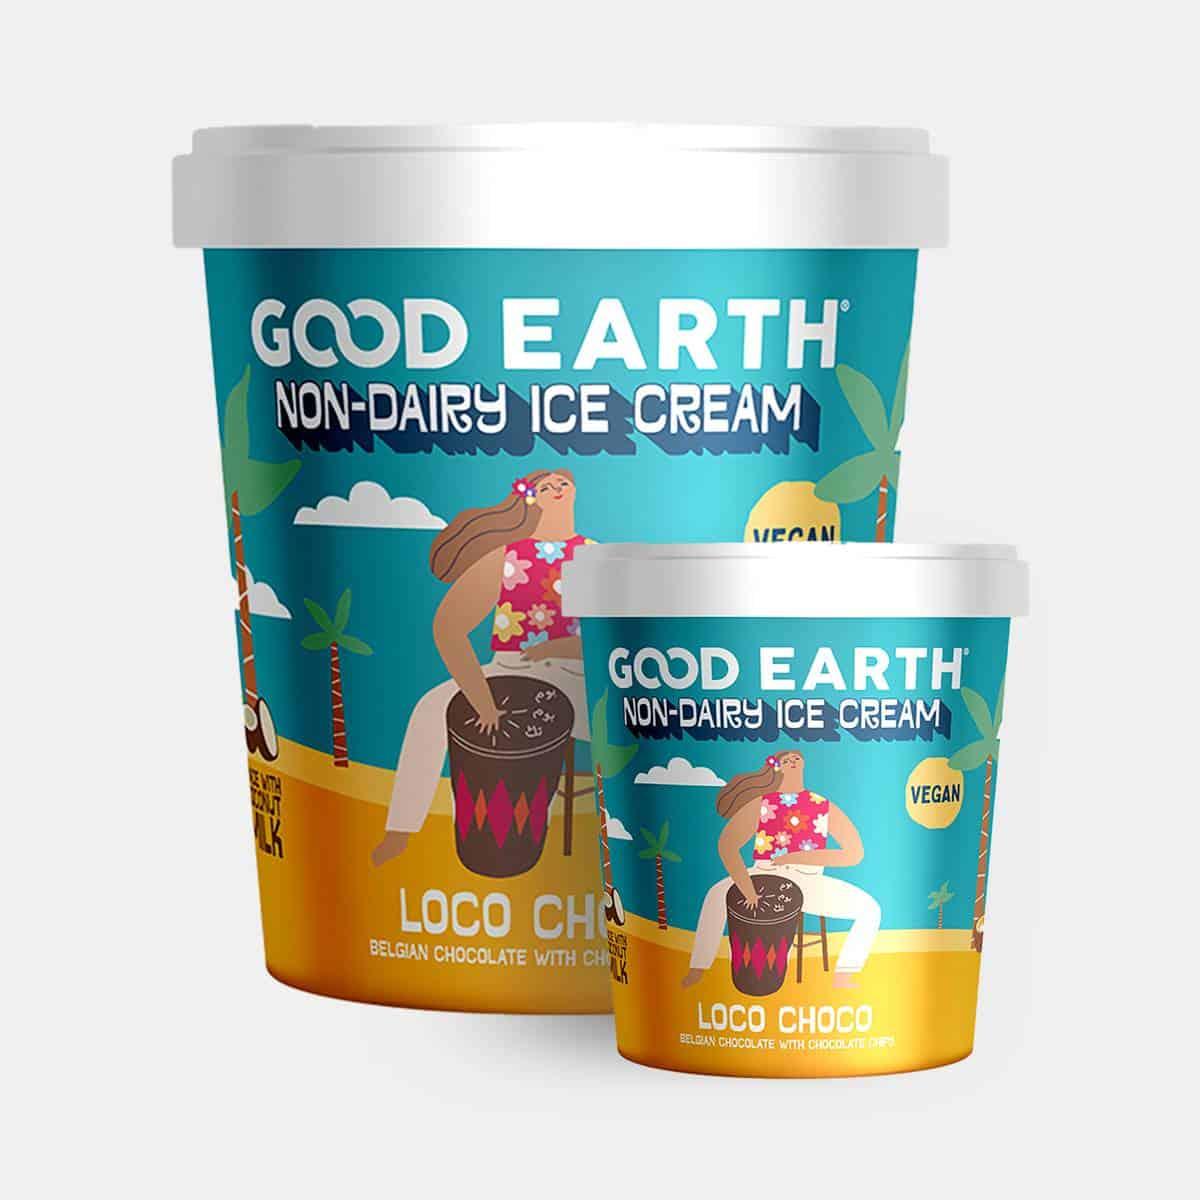 Good Earth Loco Choco Non-Dairy Ice-Cream 150ml and 500ml